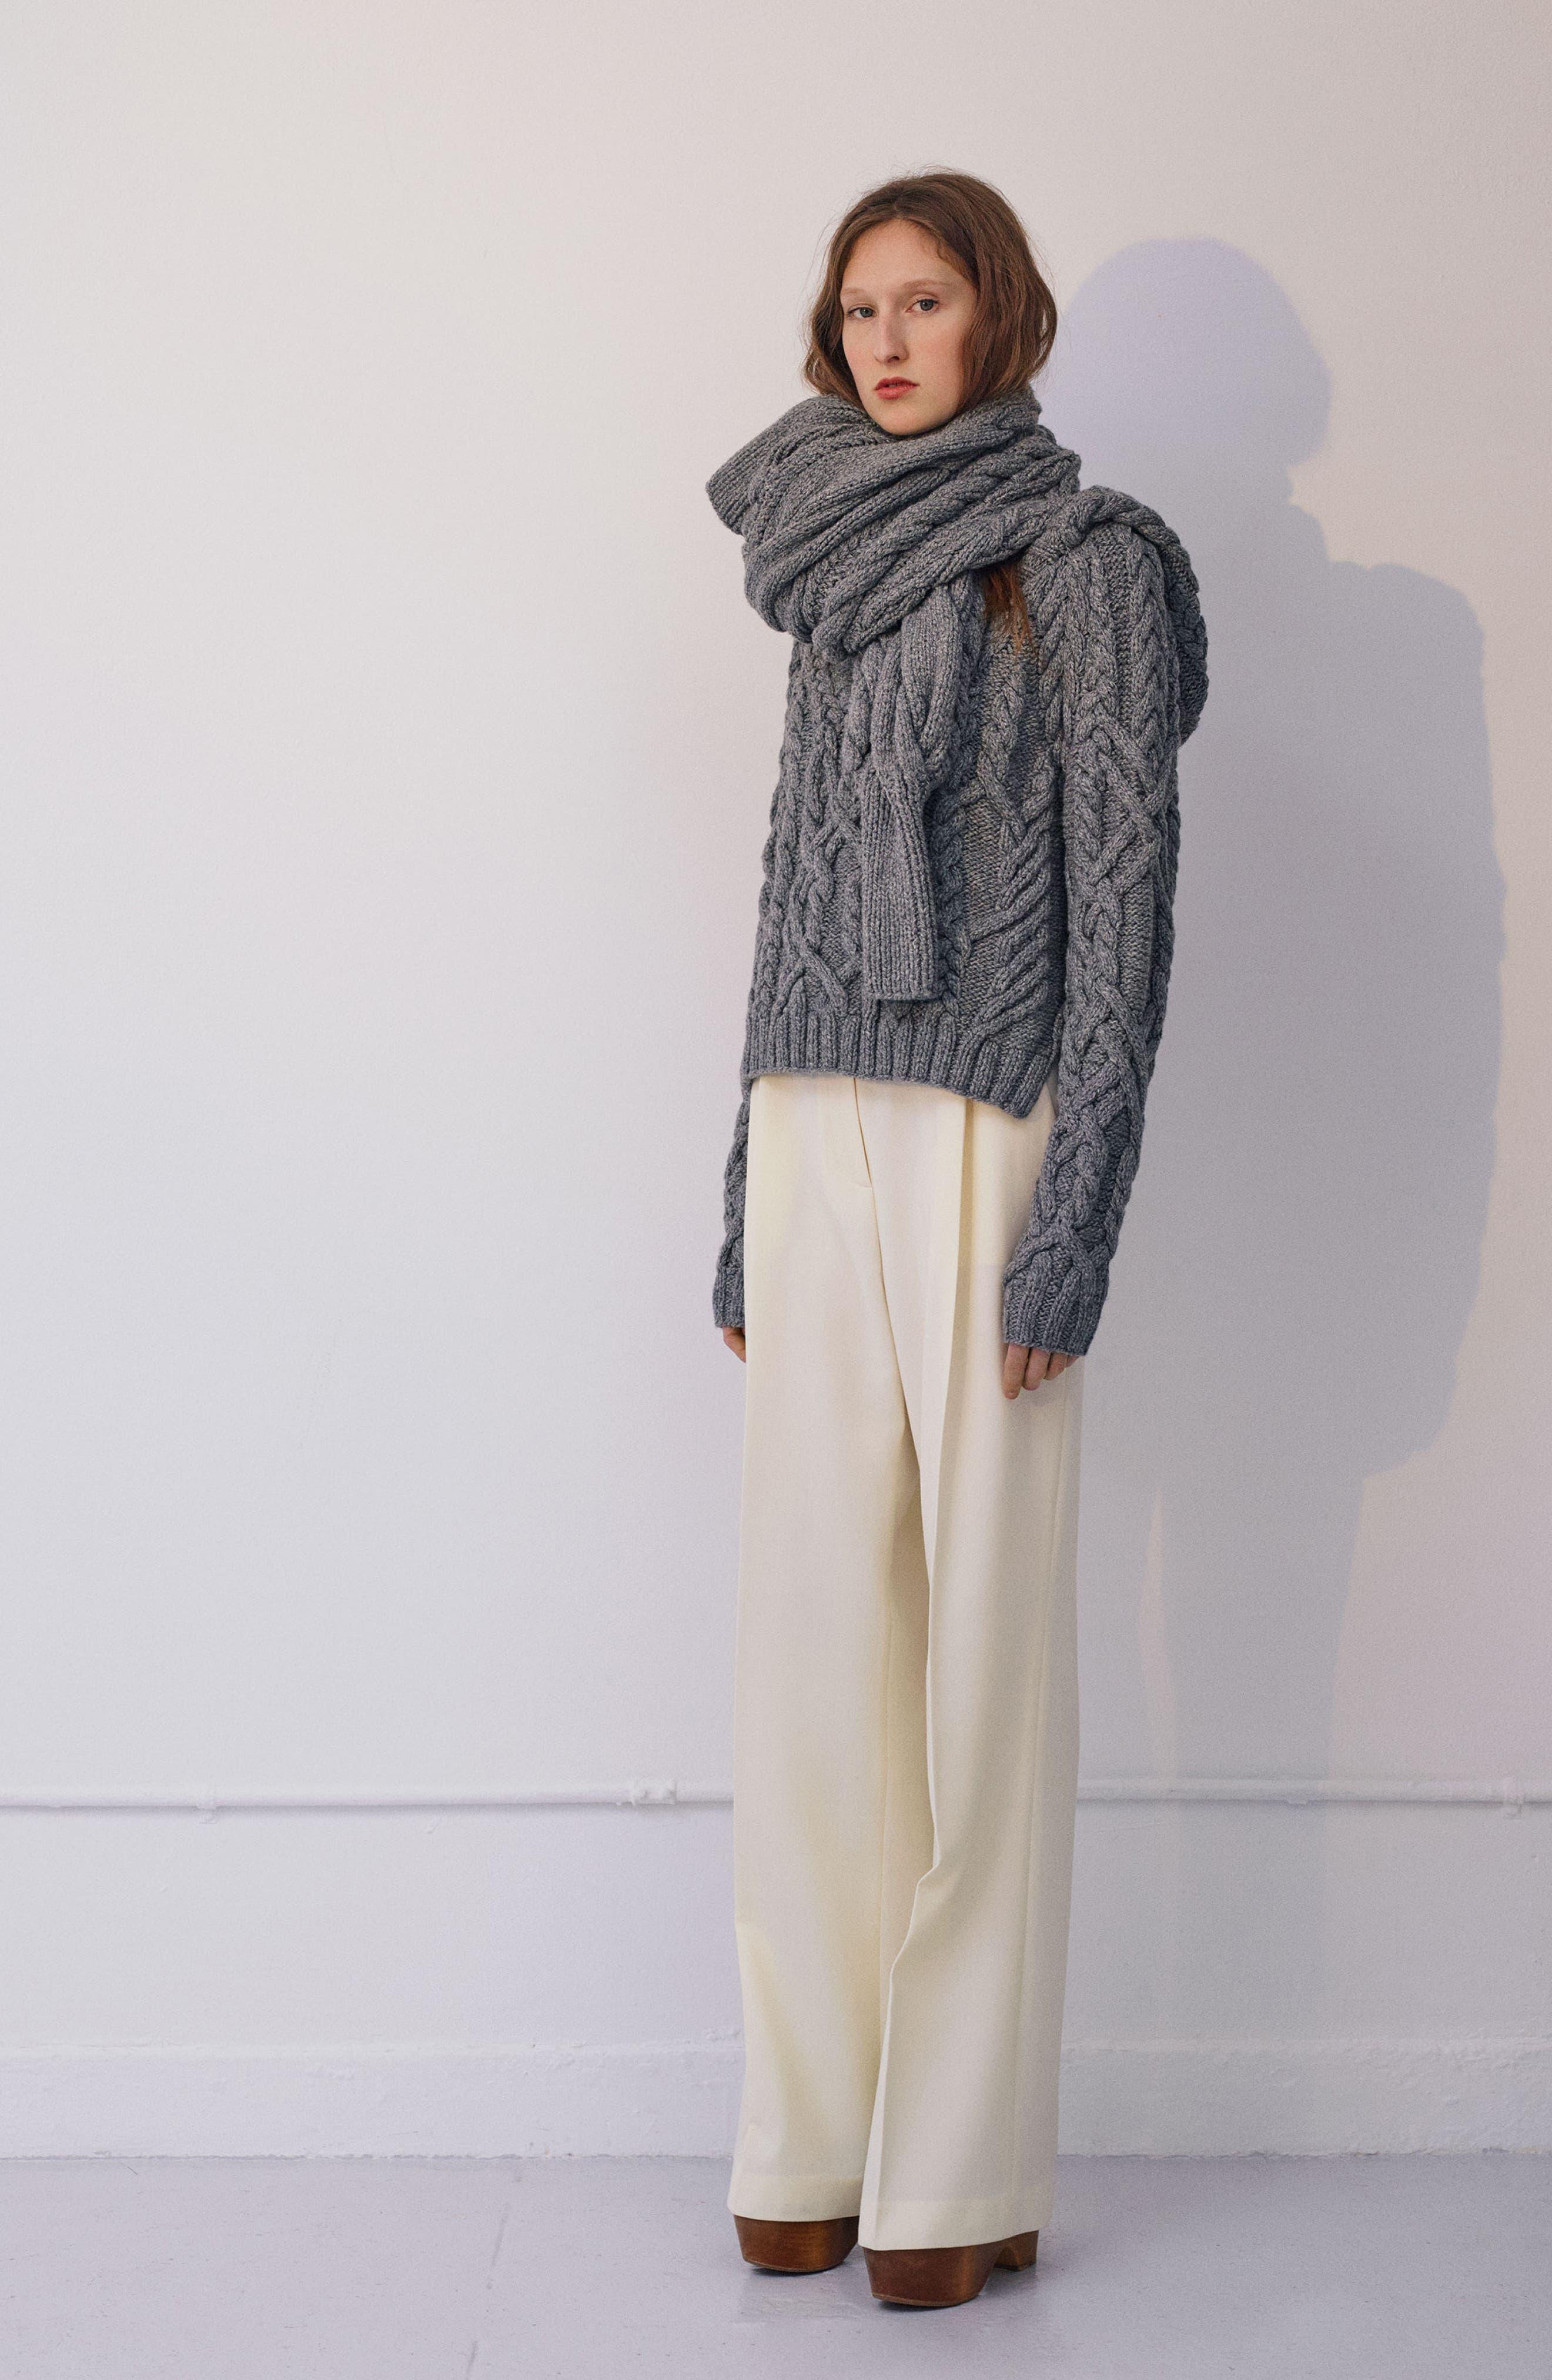 Mélange Cable Knit Hooded Sweater,                             Alternate thumbnail 7, color,                             GREY MELANGE